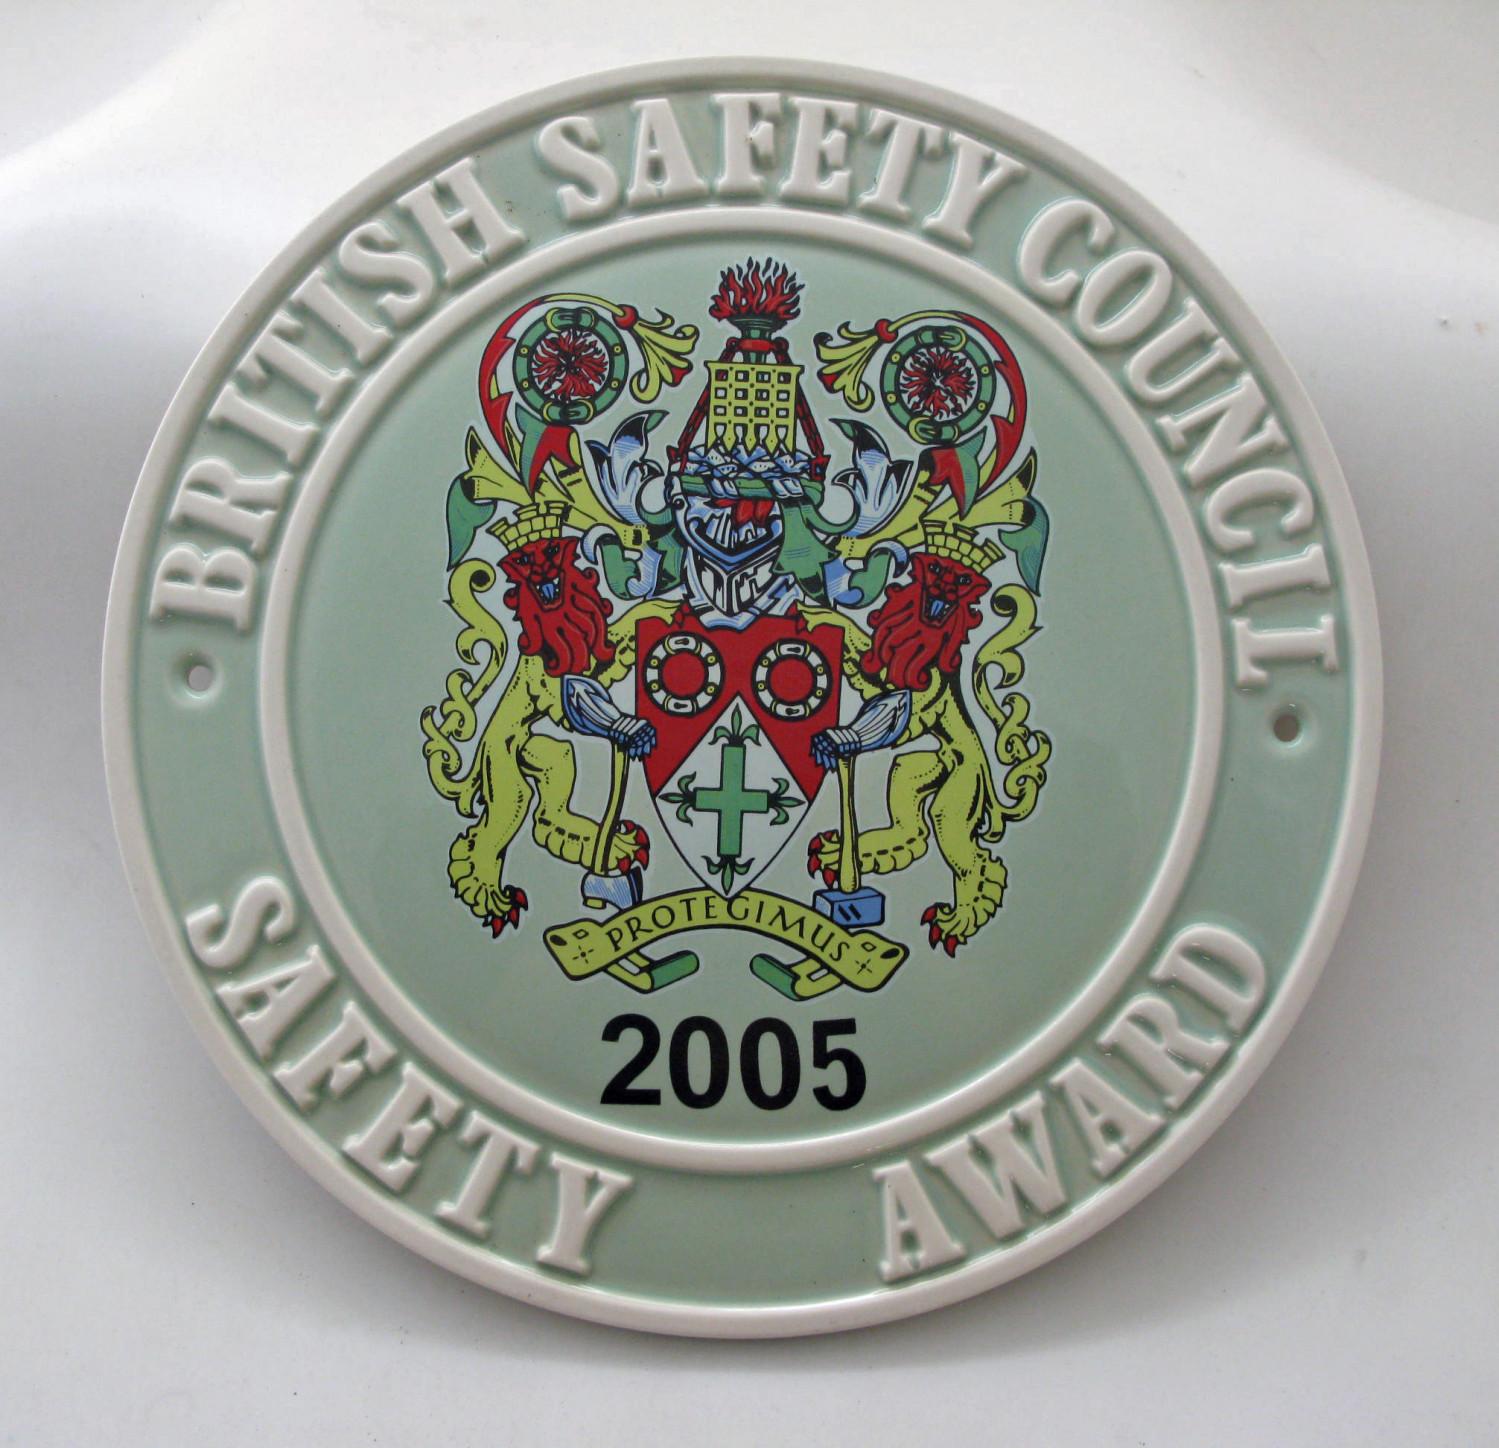 2005 Safety Award Plaque